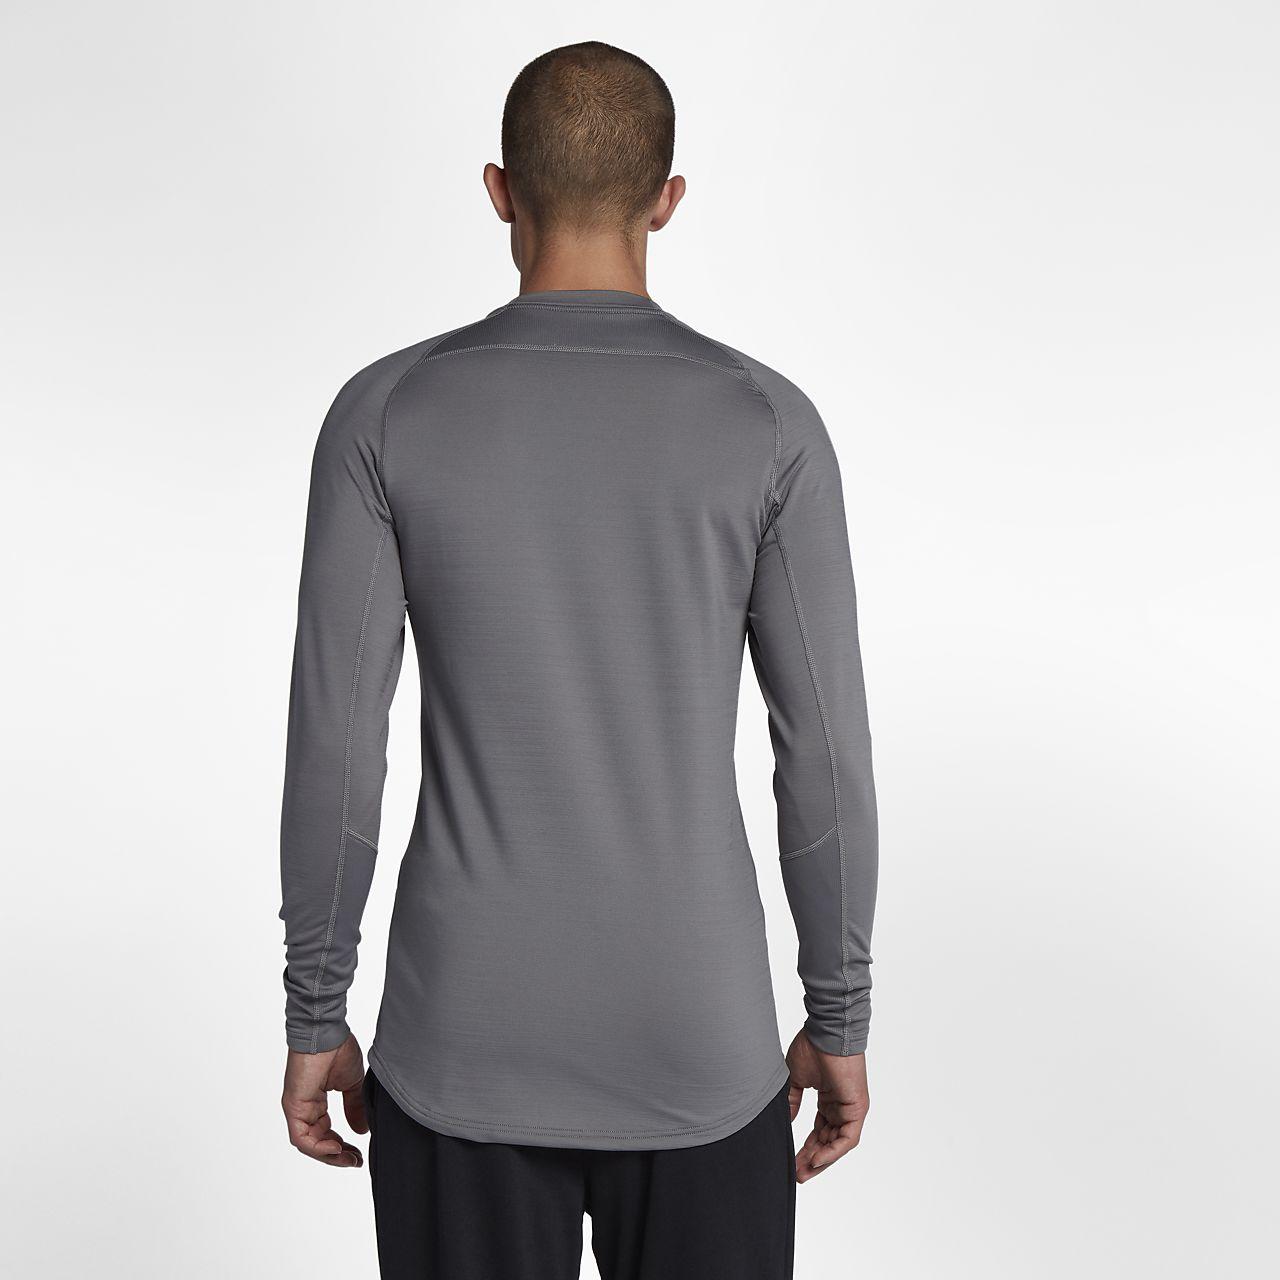 ee9d1b3edb6 Nike Pro Warm Men s Long-Sleeve Training Top. Nike.com NZ